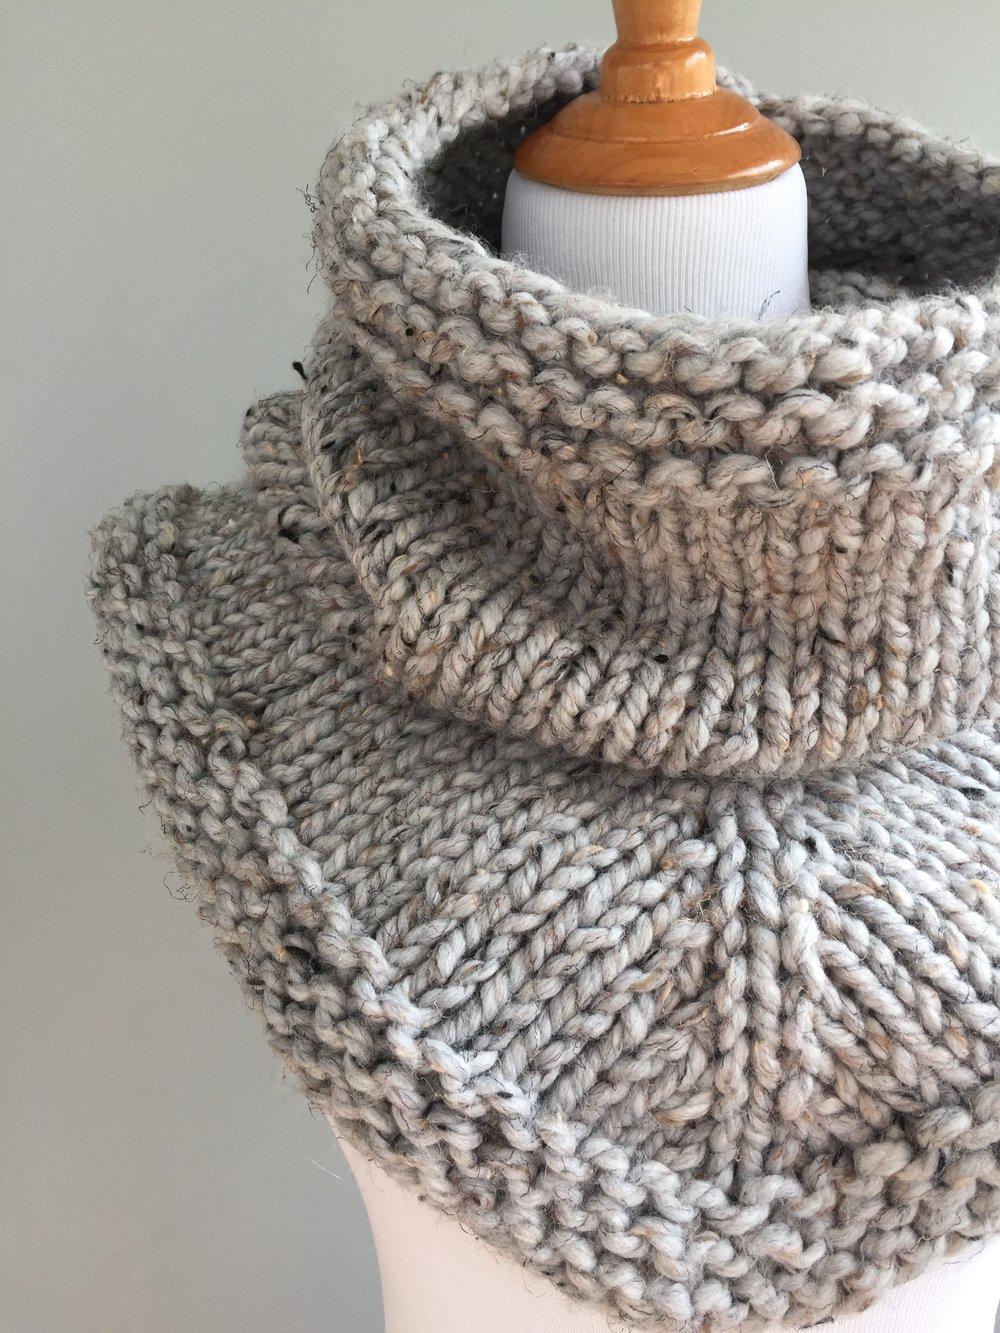 Knit Stockinette Bandana Cowl Pattern — Knit Freely